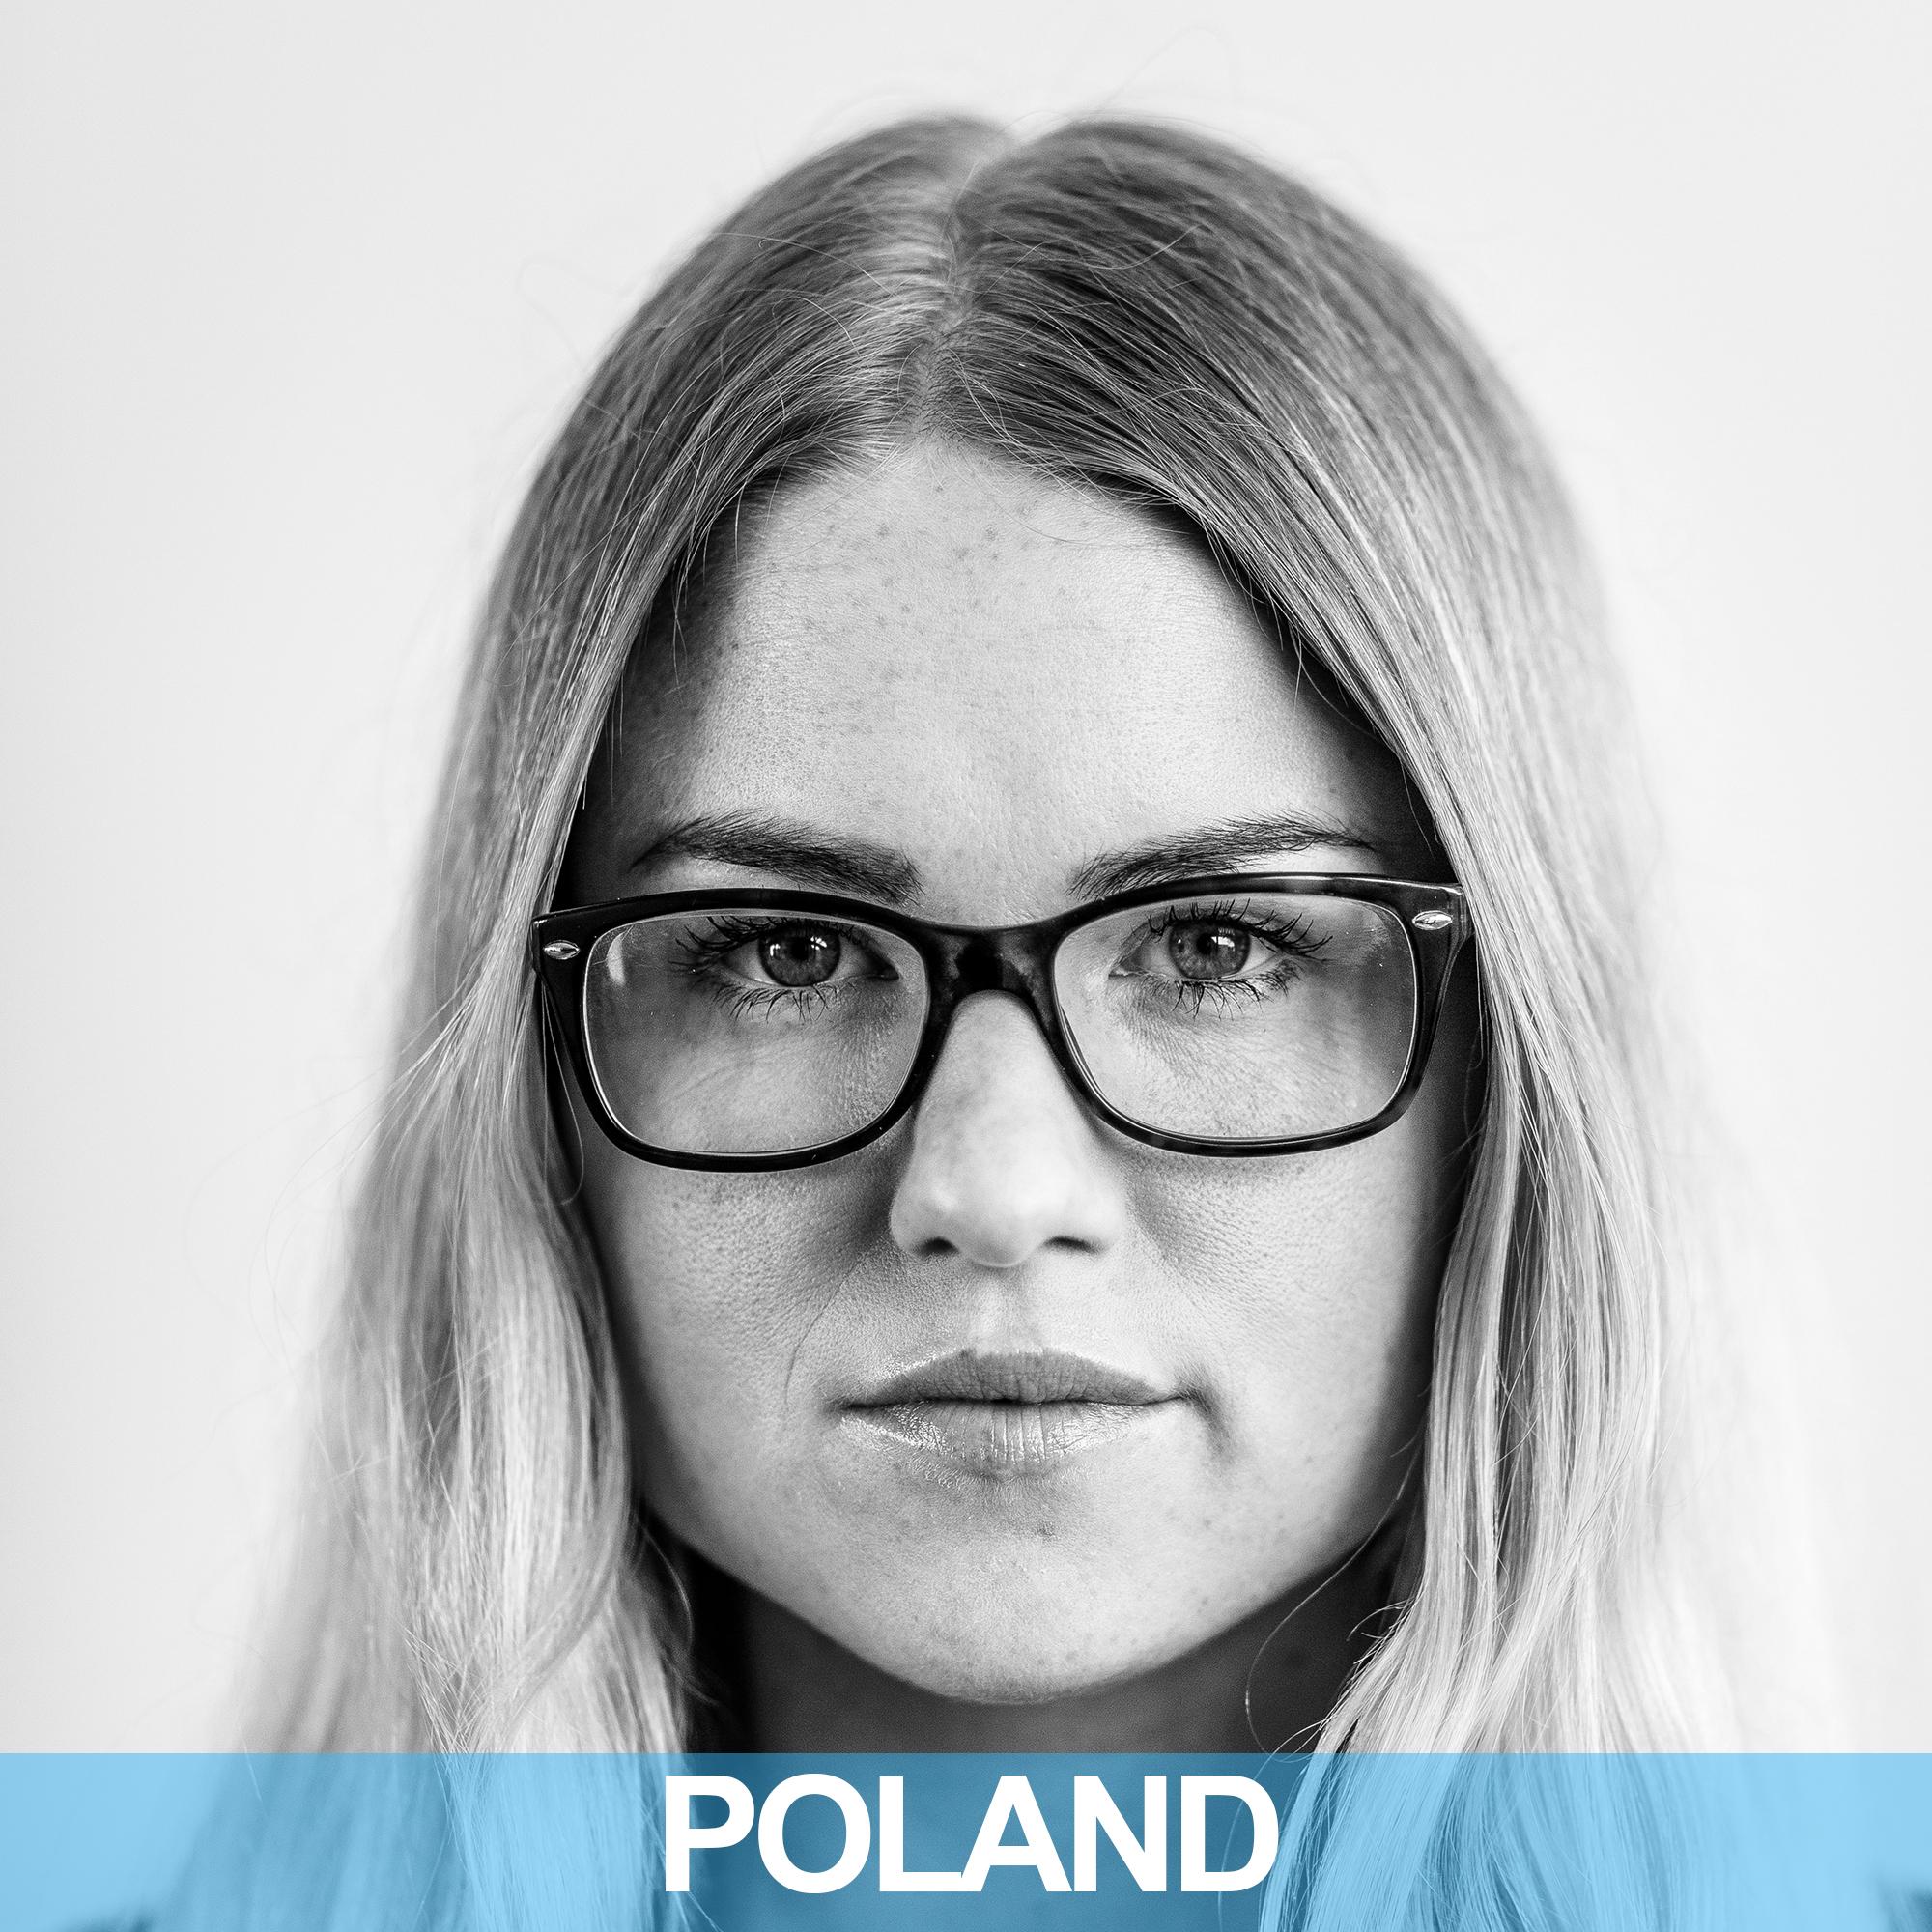 Maria Danmark Nielsen